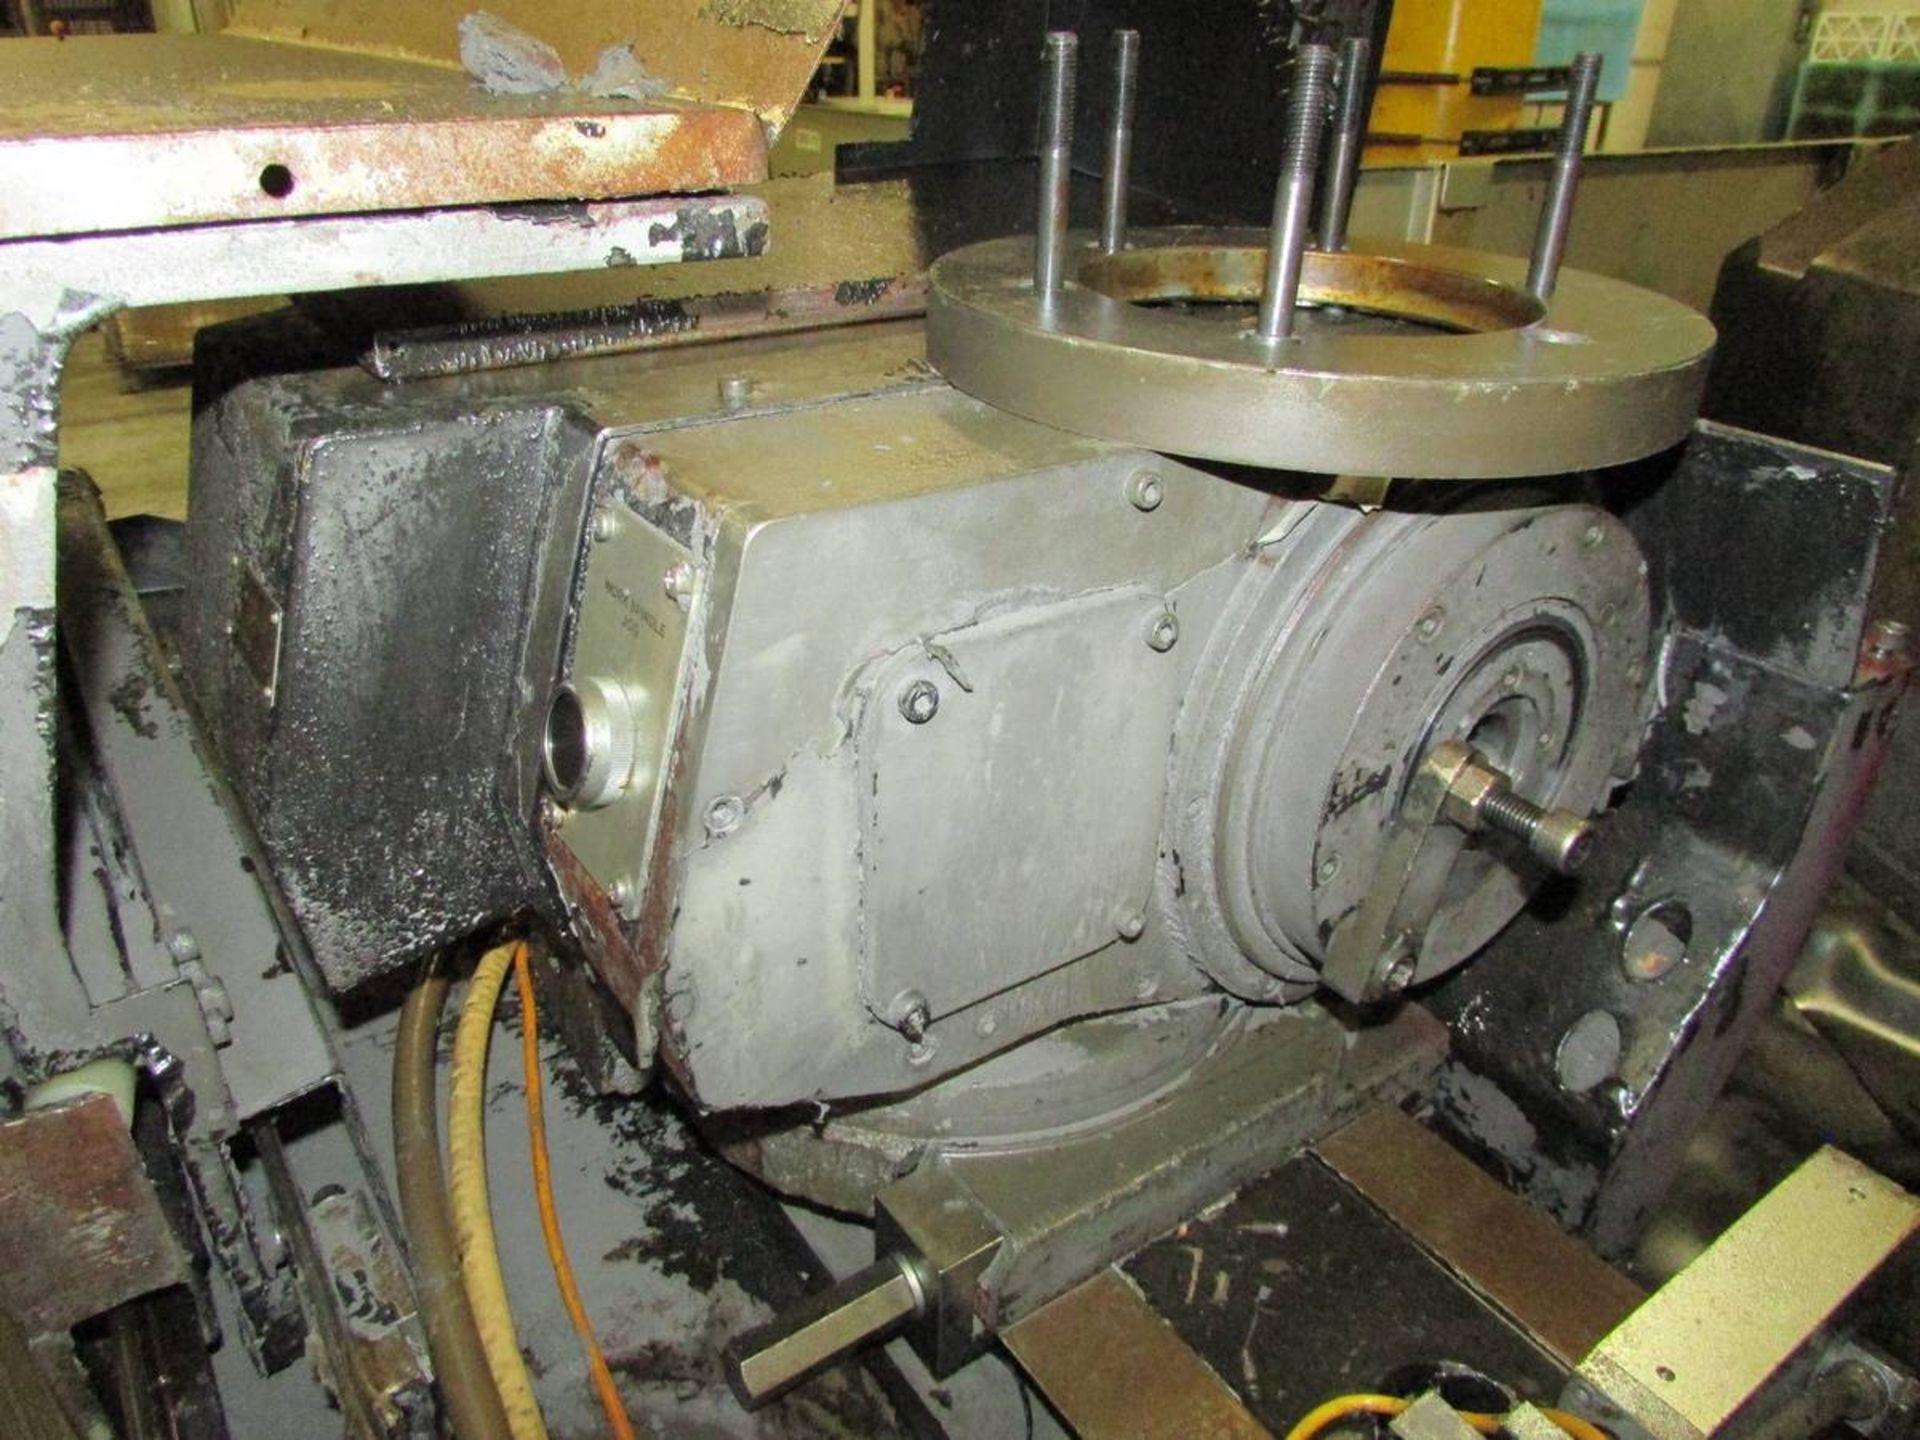 2012 Toyoda/ JTEKT 45m Select G II CNC OD Cylindrical Grinder - Image 6 of 21